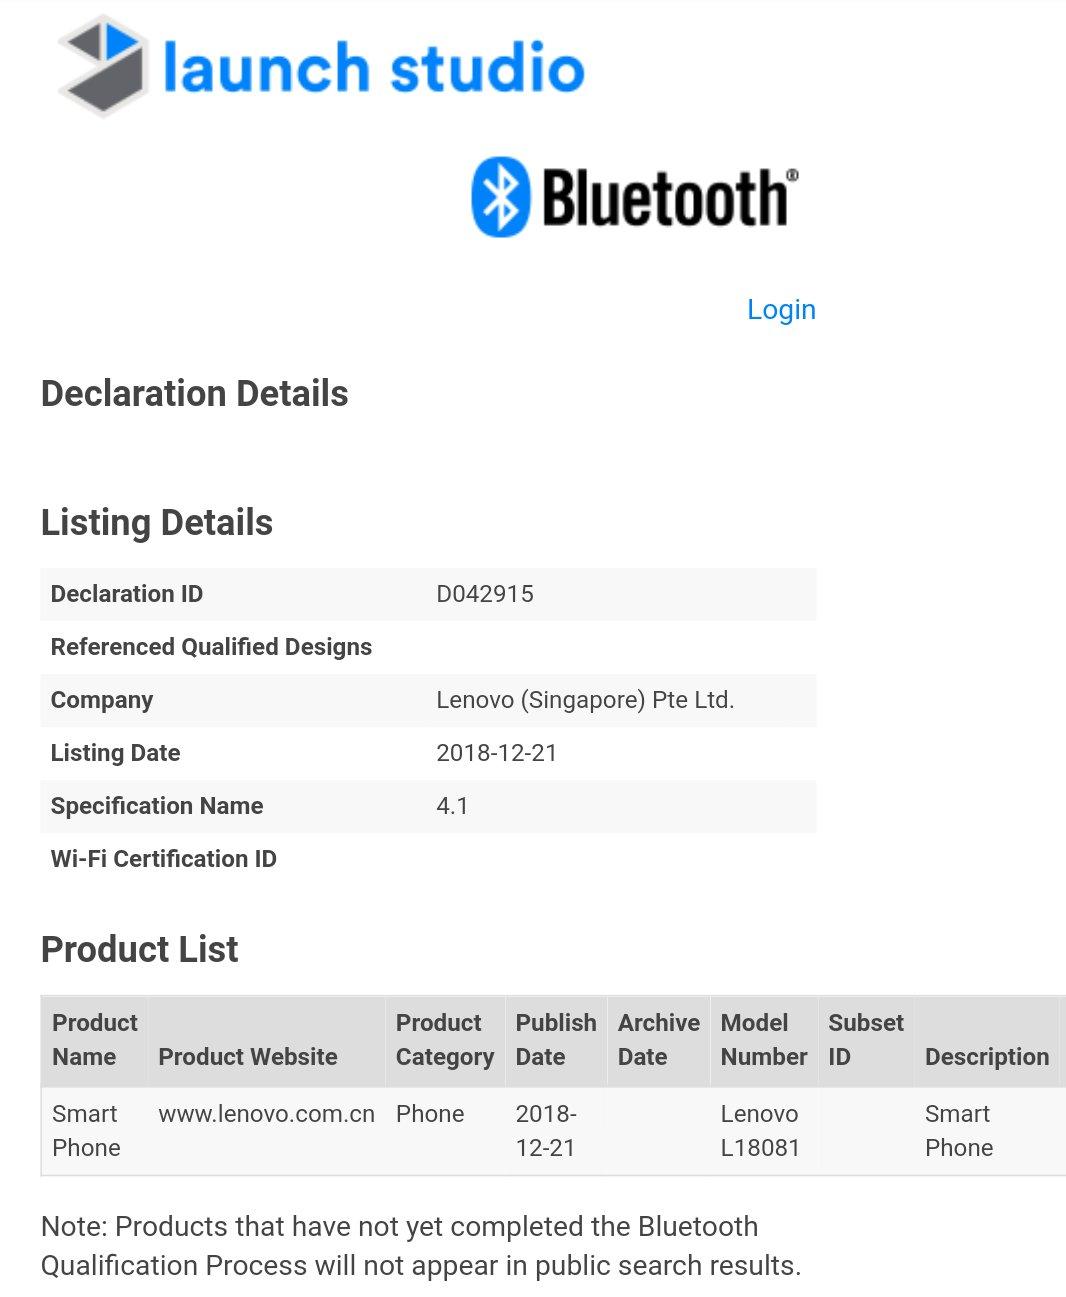 Lenovo 18081 Bluetooth certification